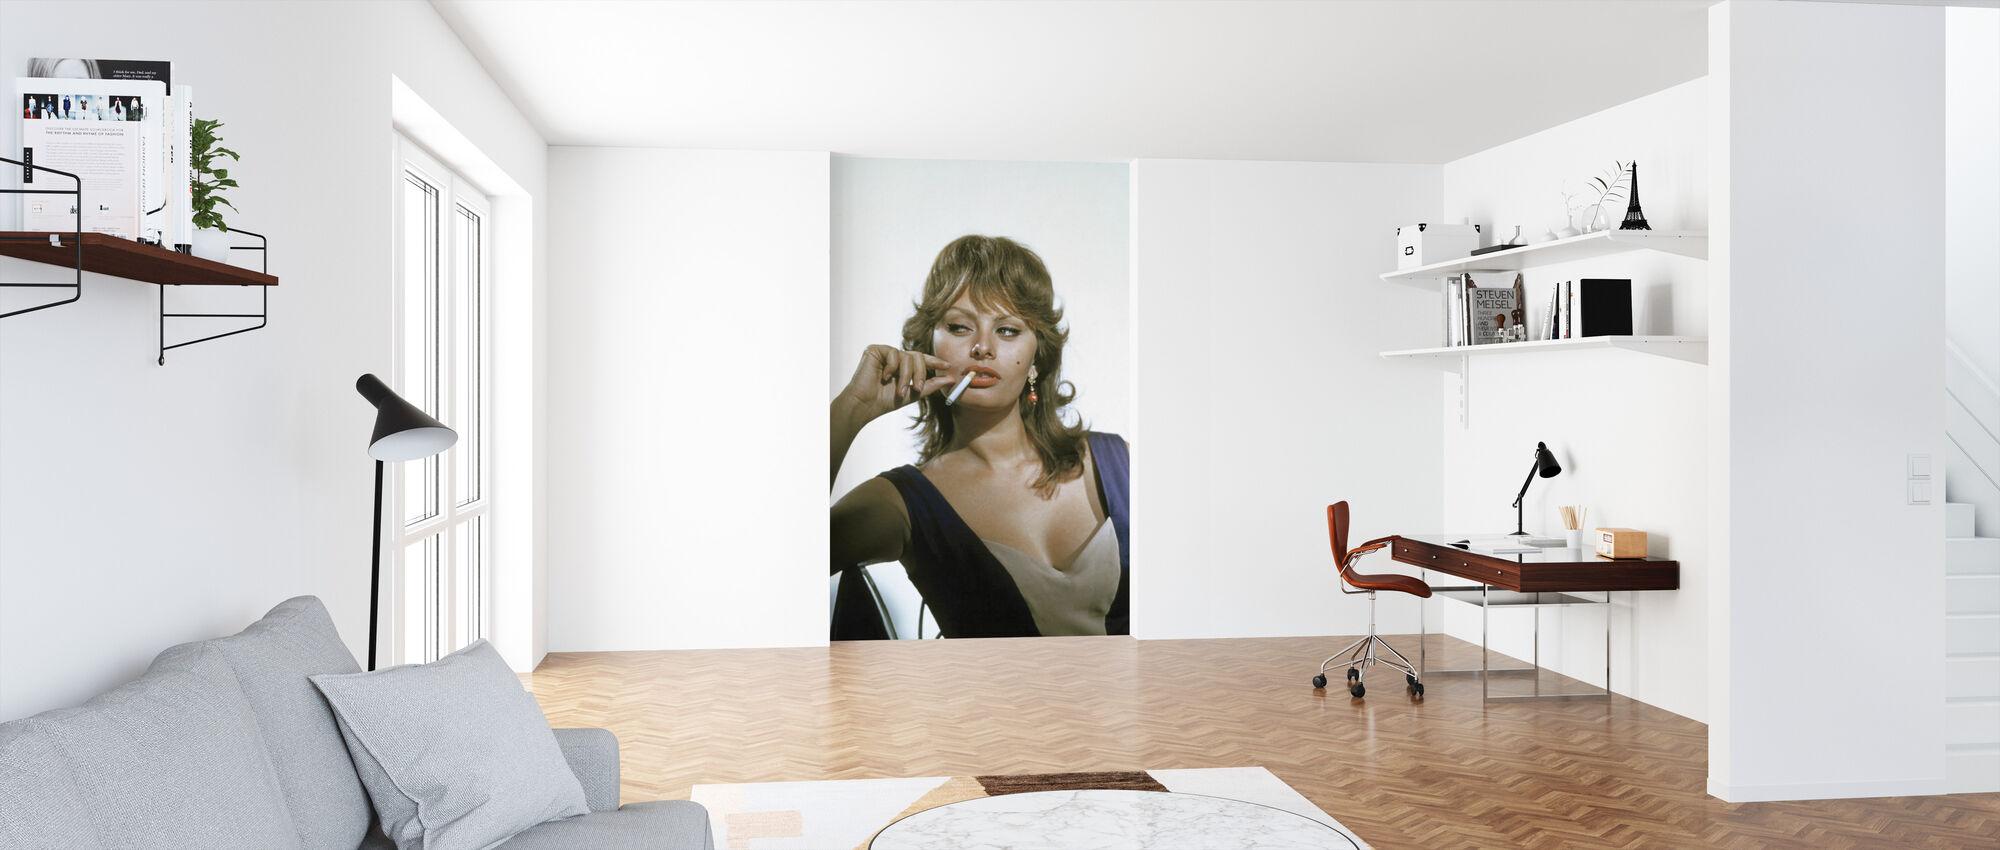 Sophia Loren - Tapet - Kontor